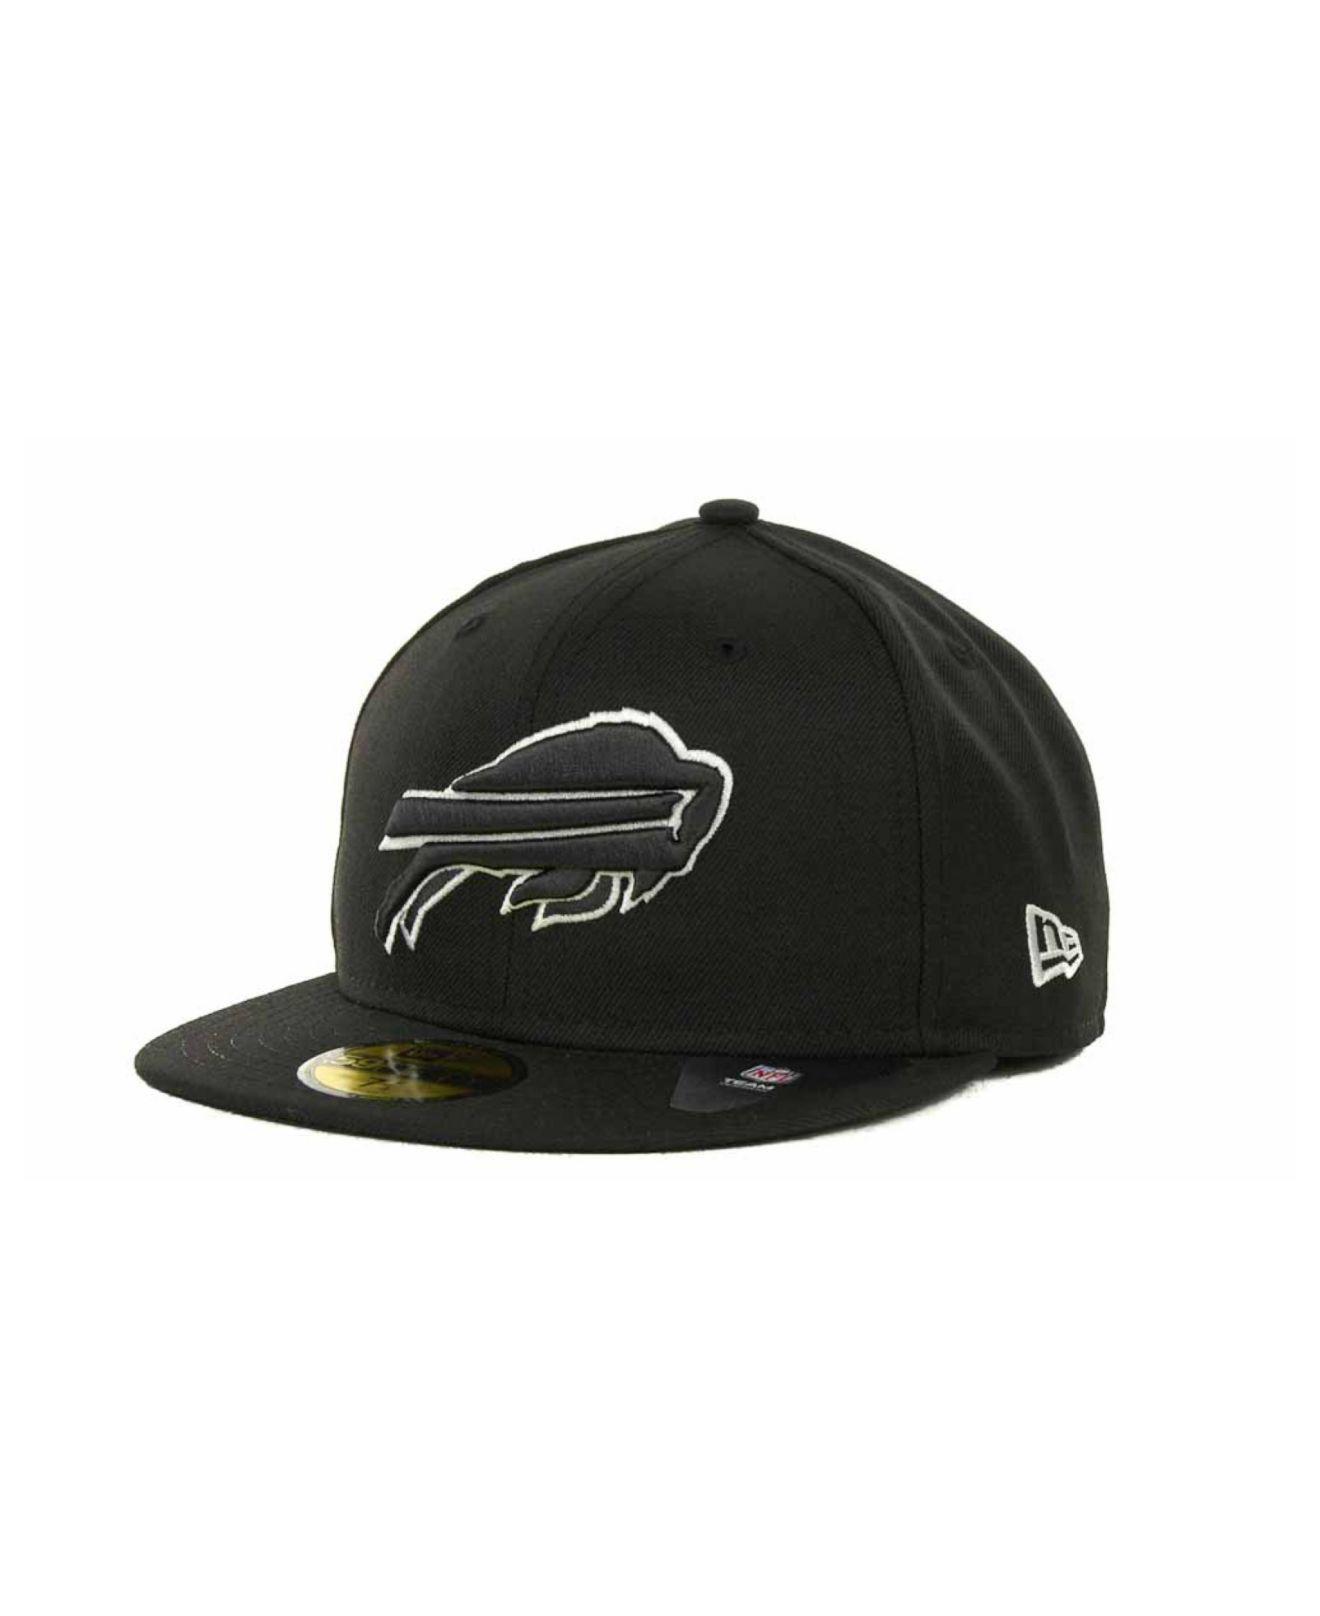 Lyst - Ktz Buffalo Bills 59fifty Cap in Black for Men 460ba0d23a07